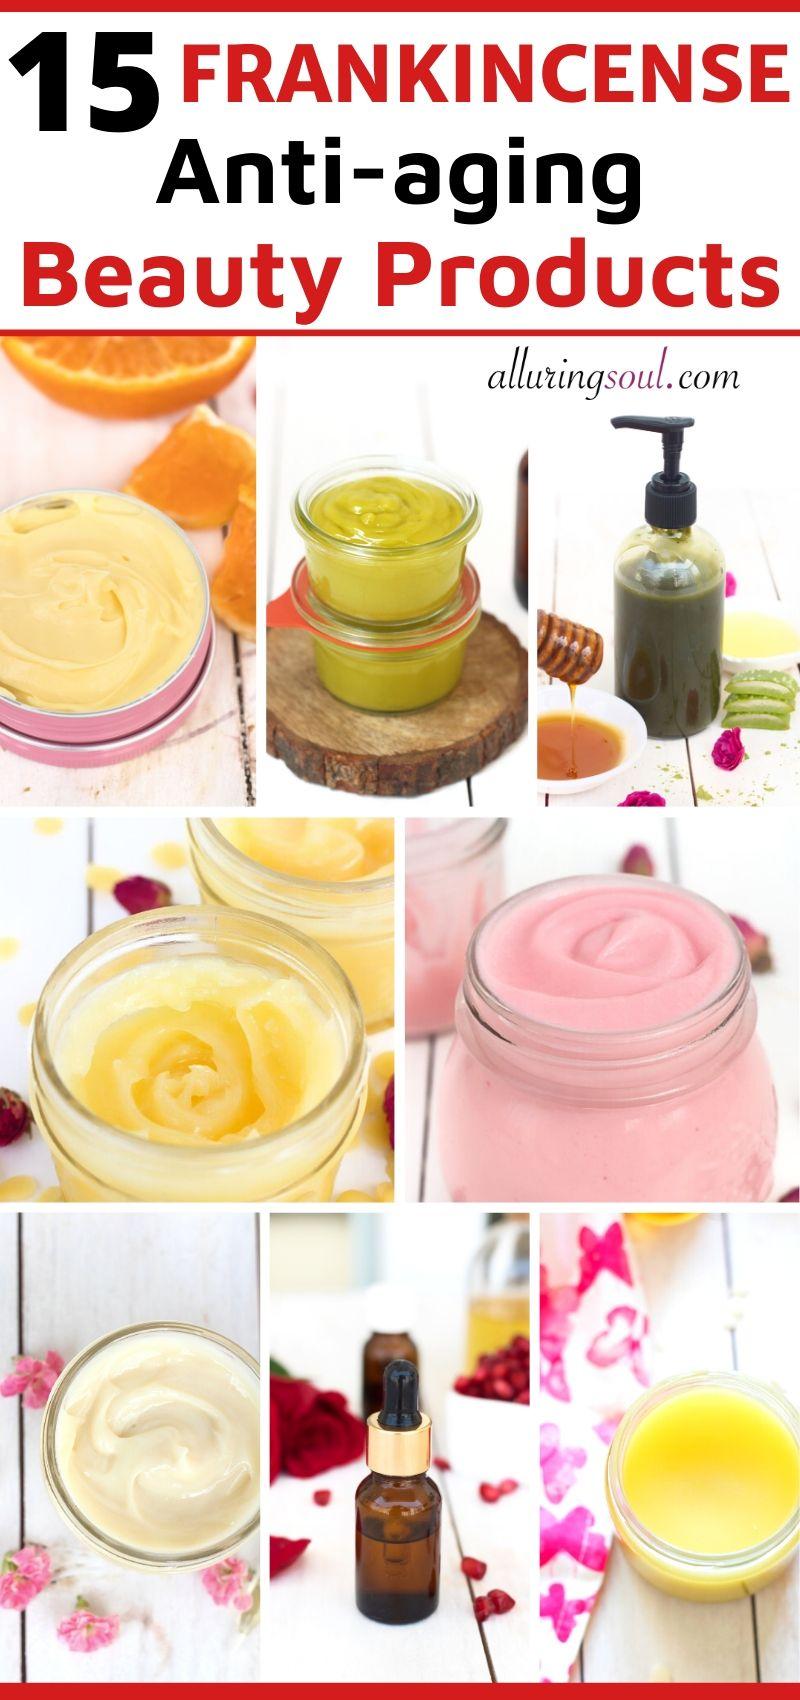 frankincense anti-aging skincare recipes